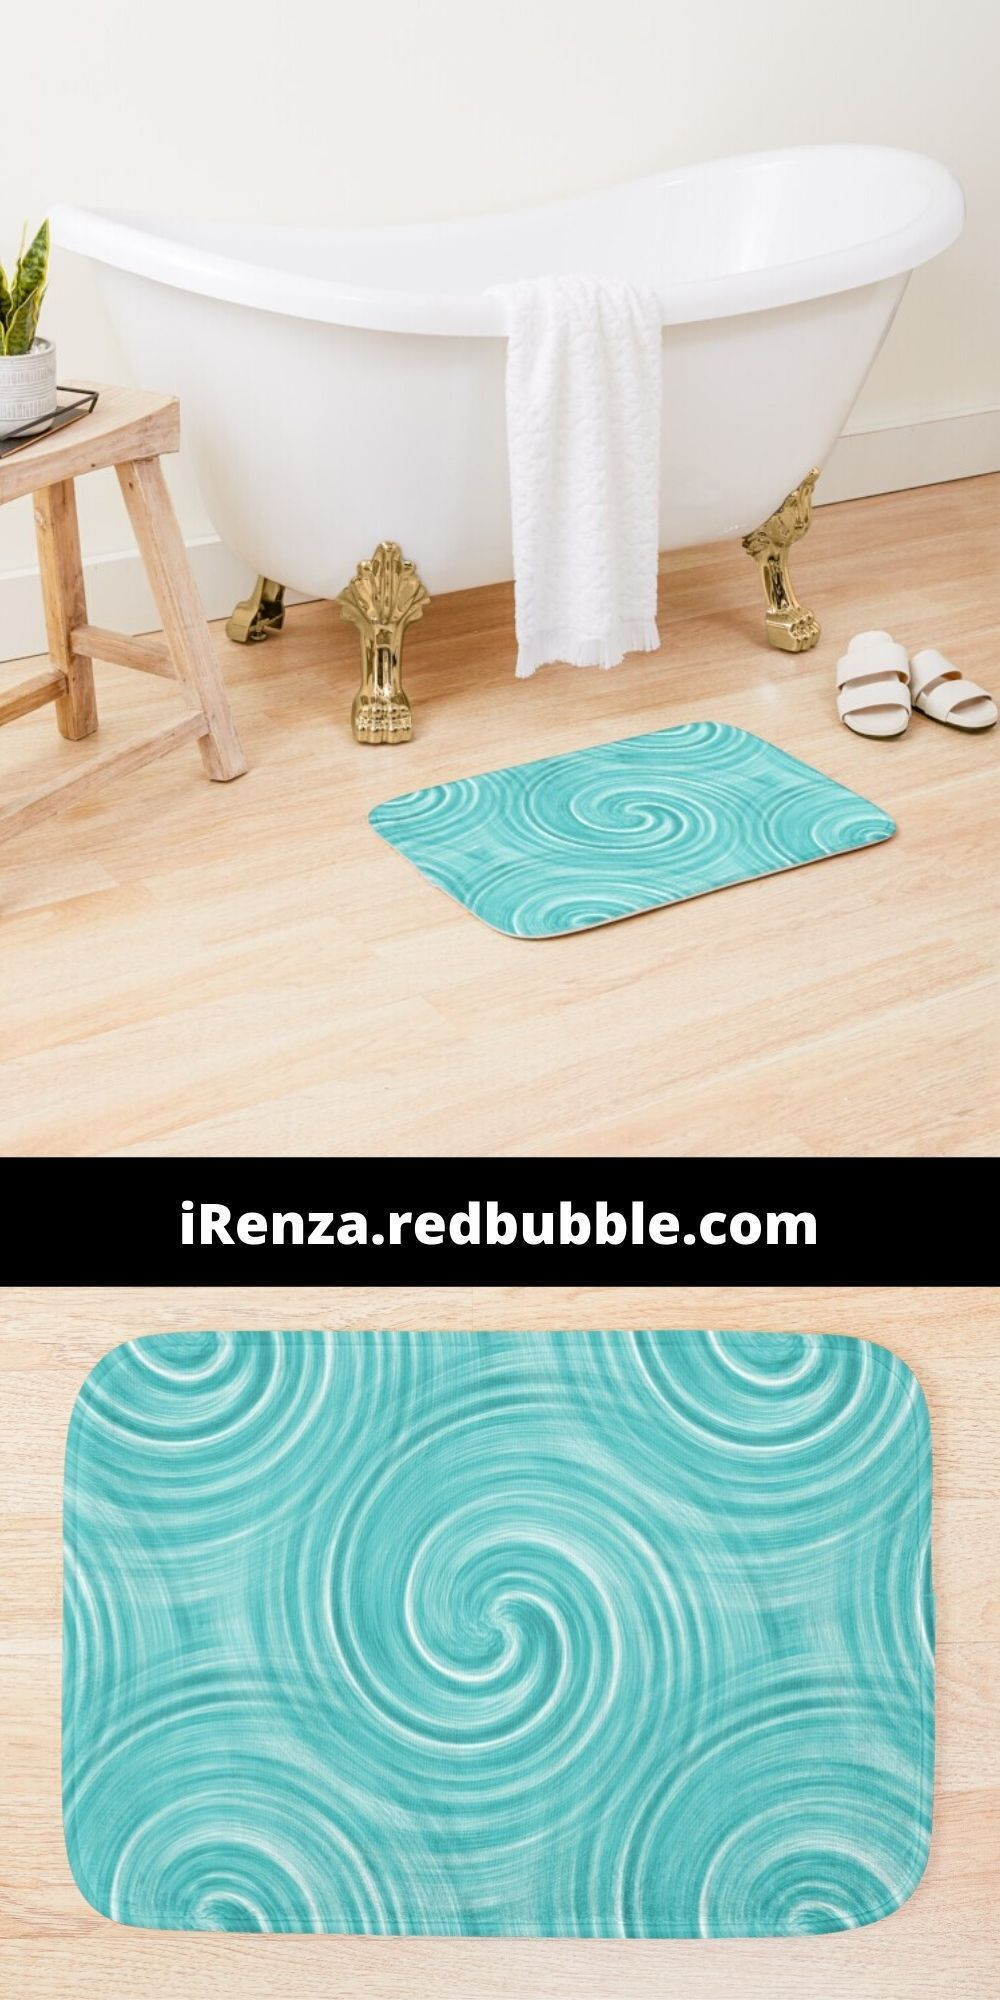 'Blue swirl liquid marble' Bath Mat by iRenza in 2020